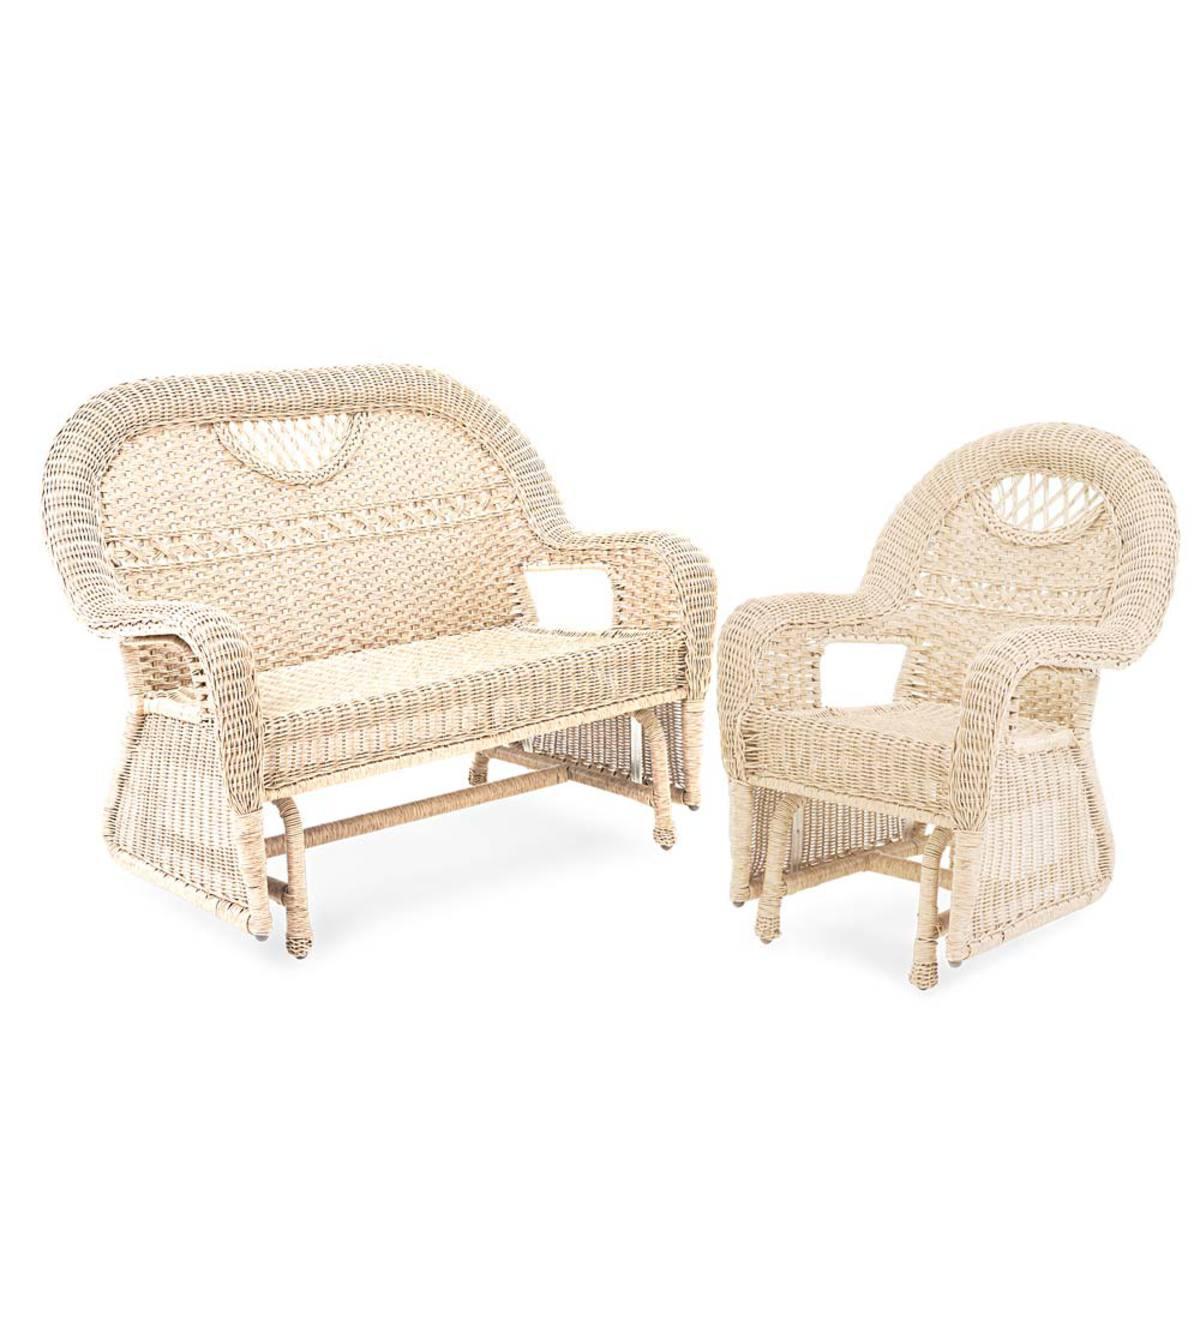 Prospect Hill Wicker Love Seat Glider And Chair Glider Set Beach House Walnut Plowhearth